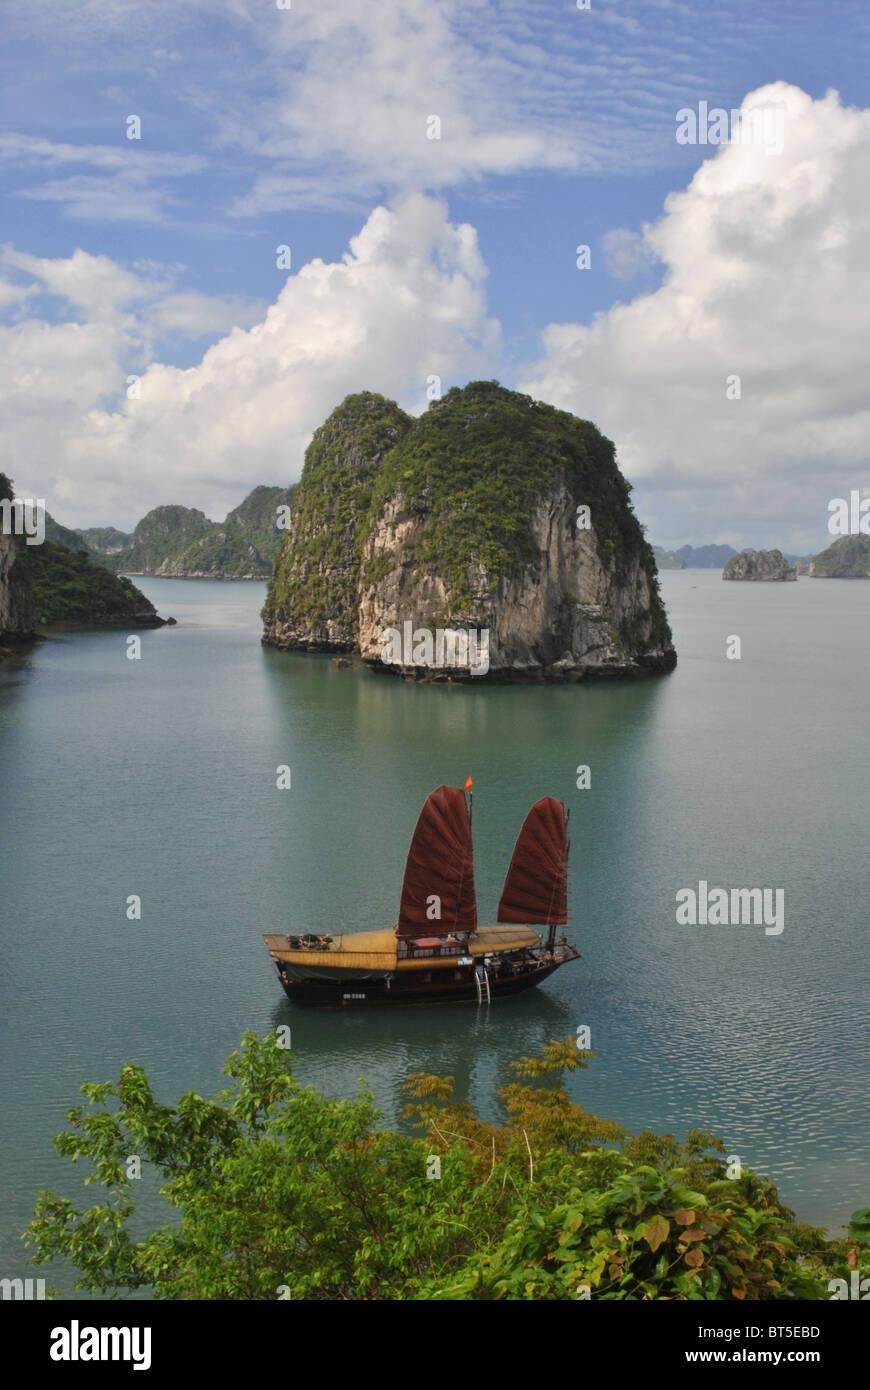 Dschunke mit roten Segel in Halong Bucht, Vietnam Stockfoto